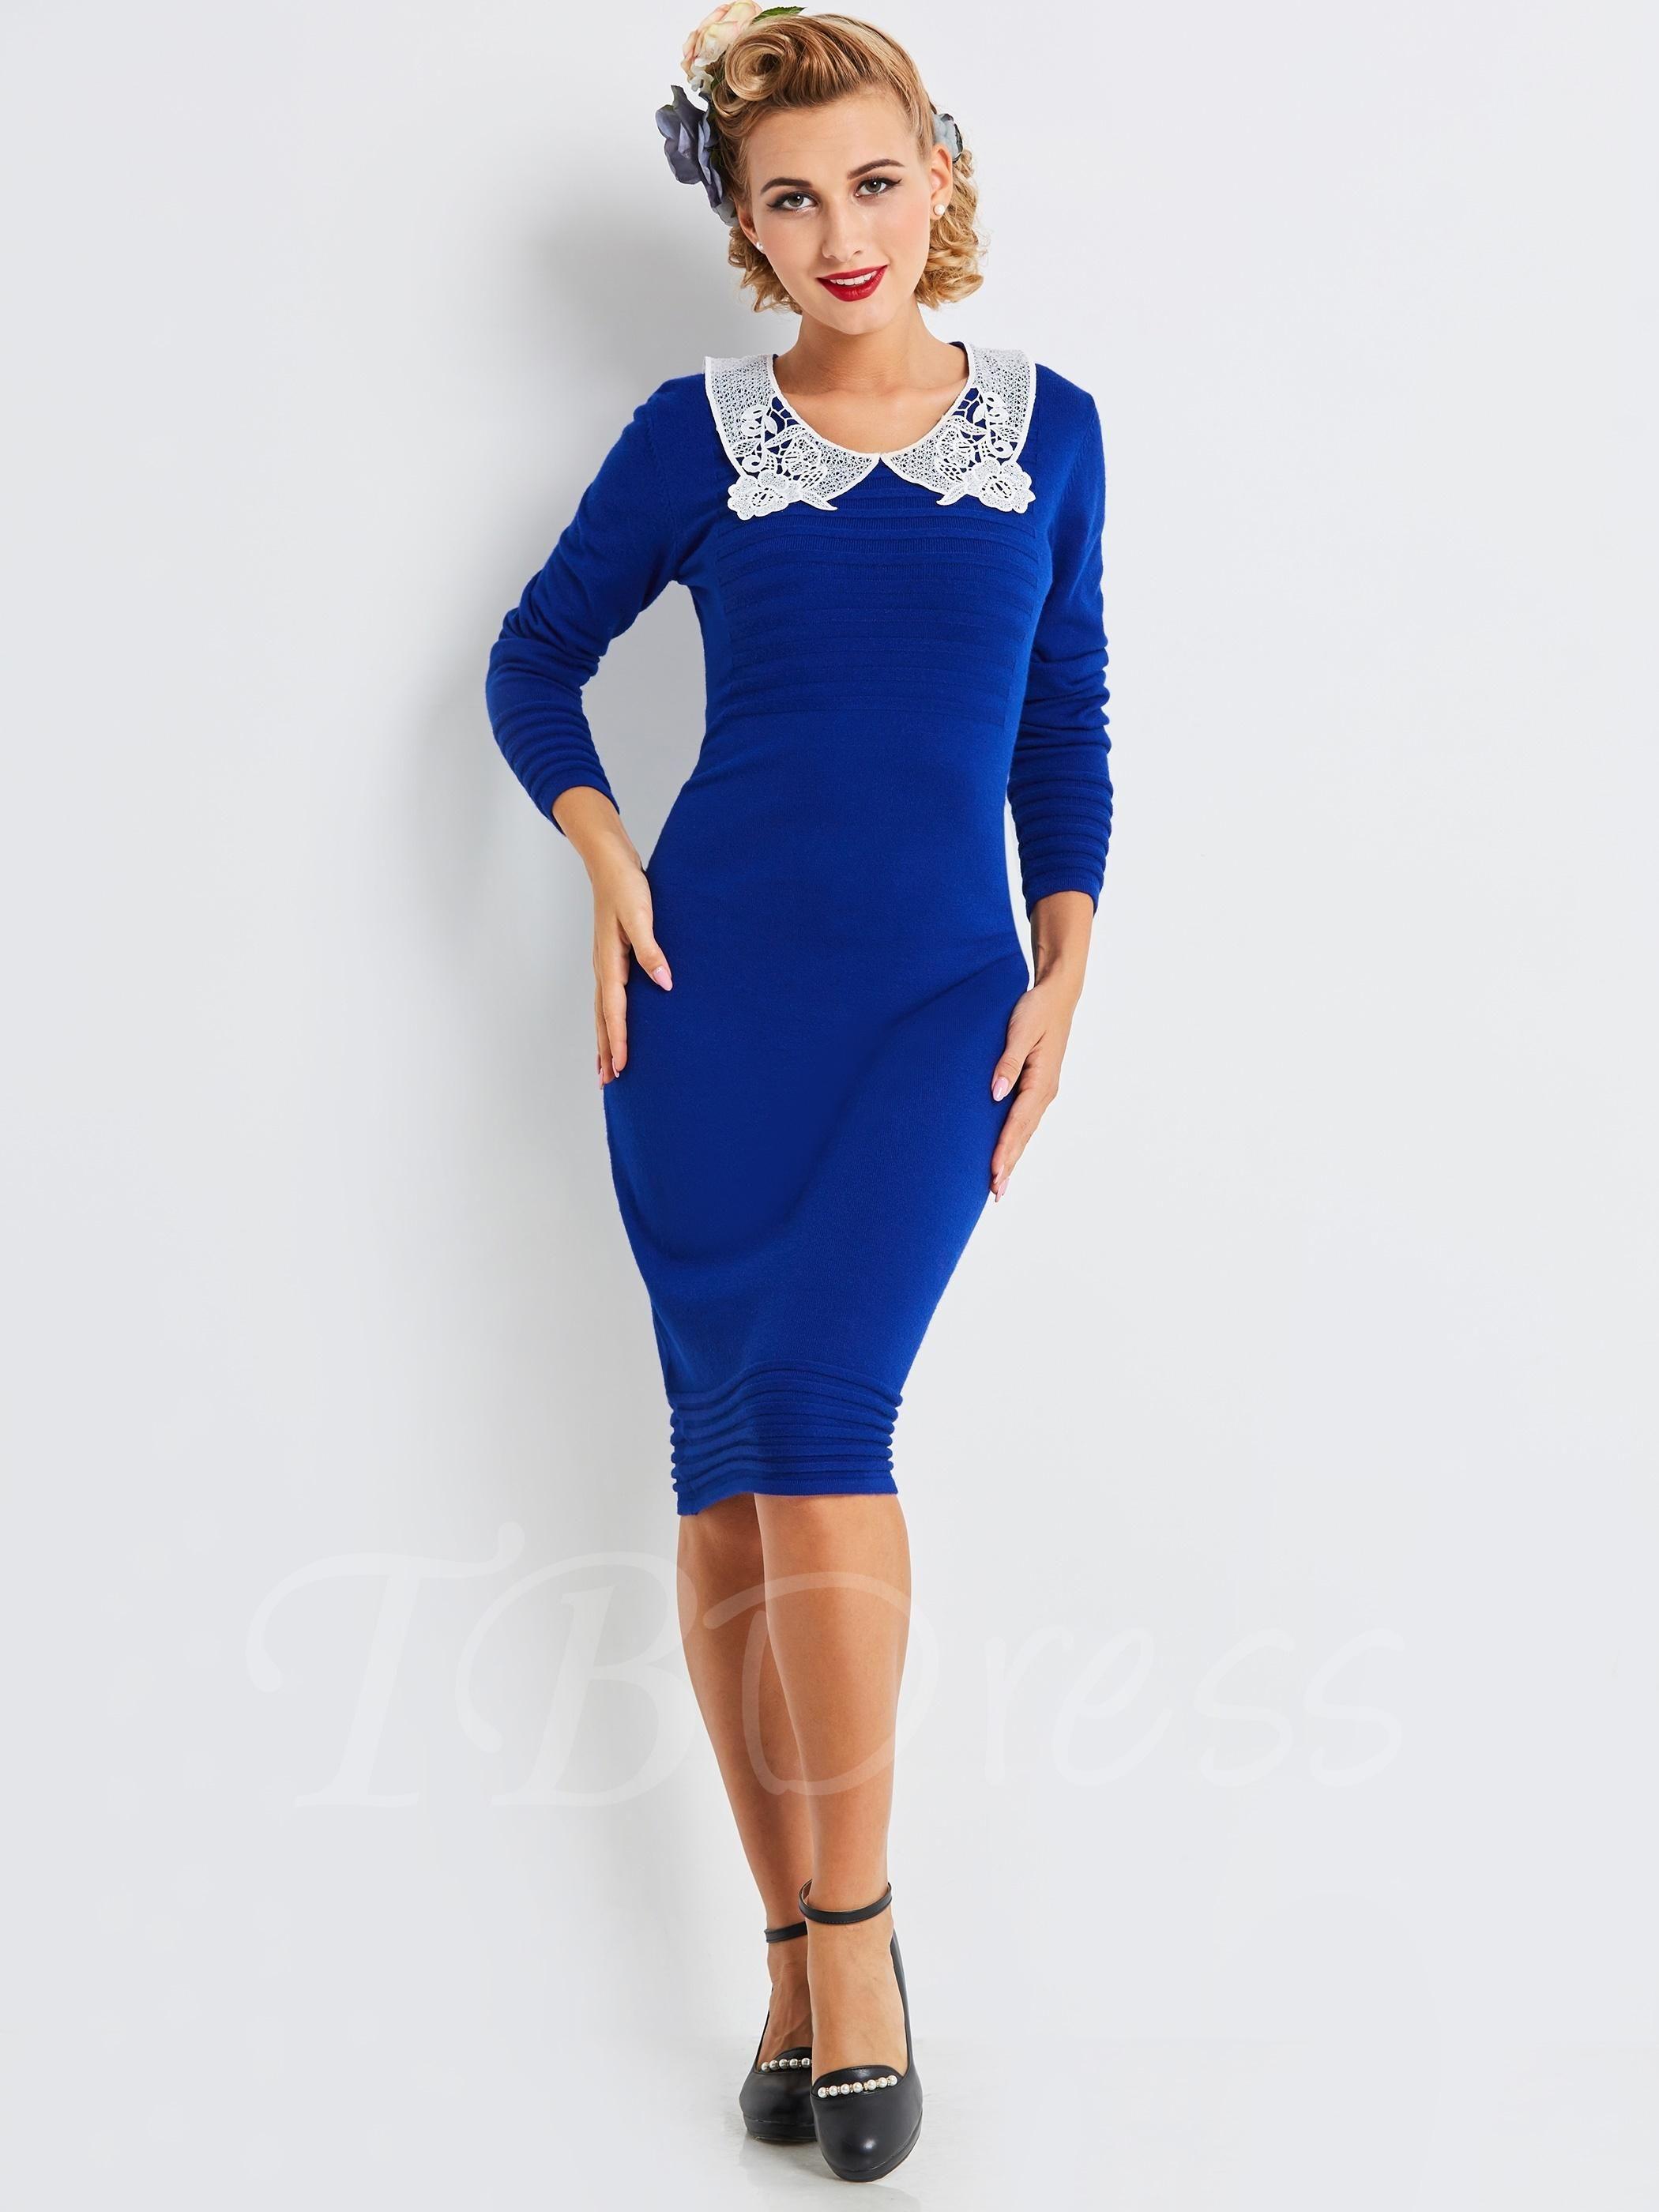 05e71c8b6ca  TBDress -  TBDress Blue Pullover Womens Sweater Dress - AdoreWe.com